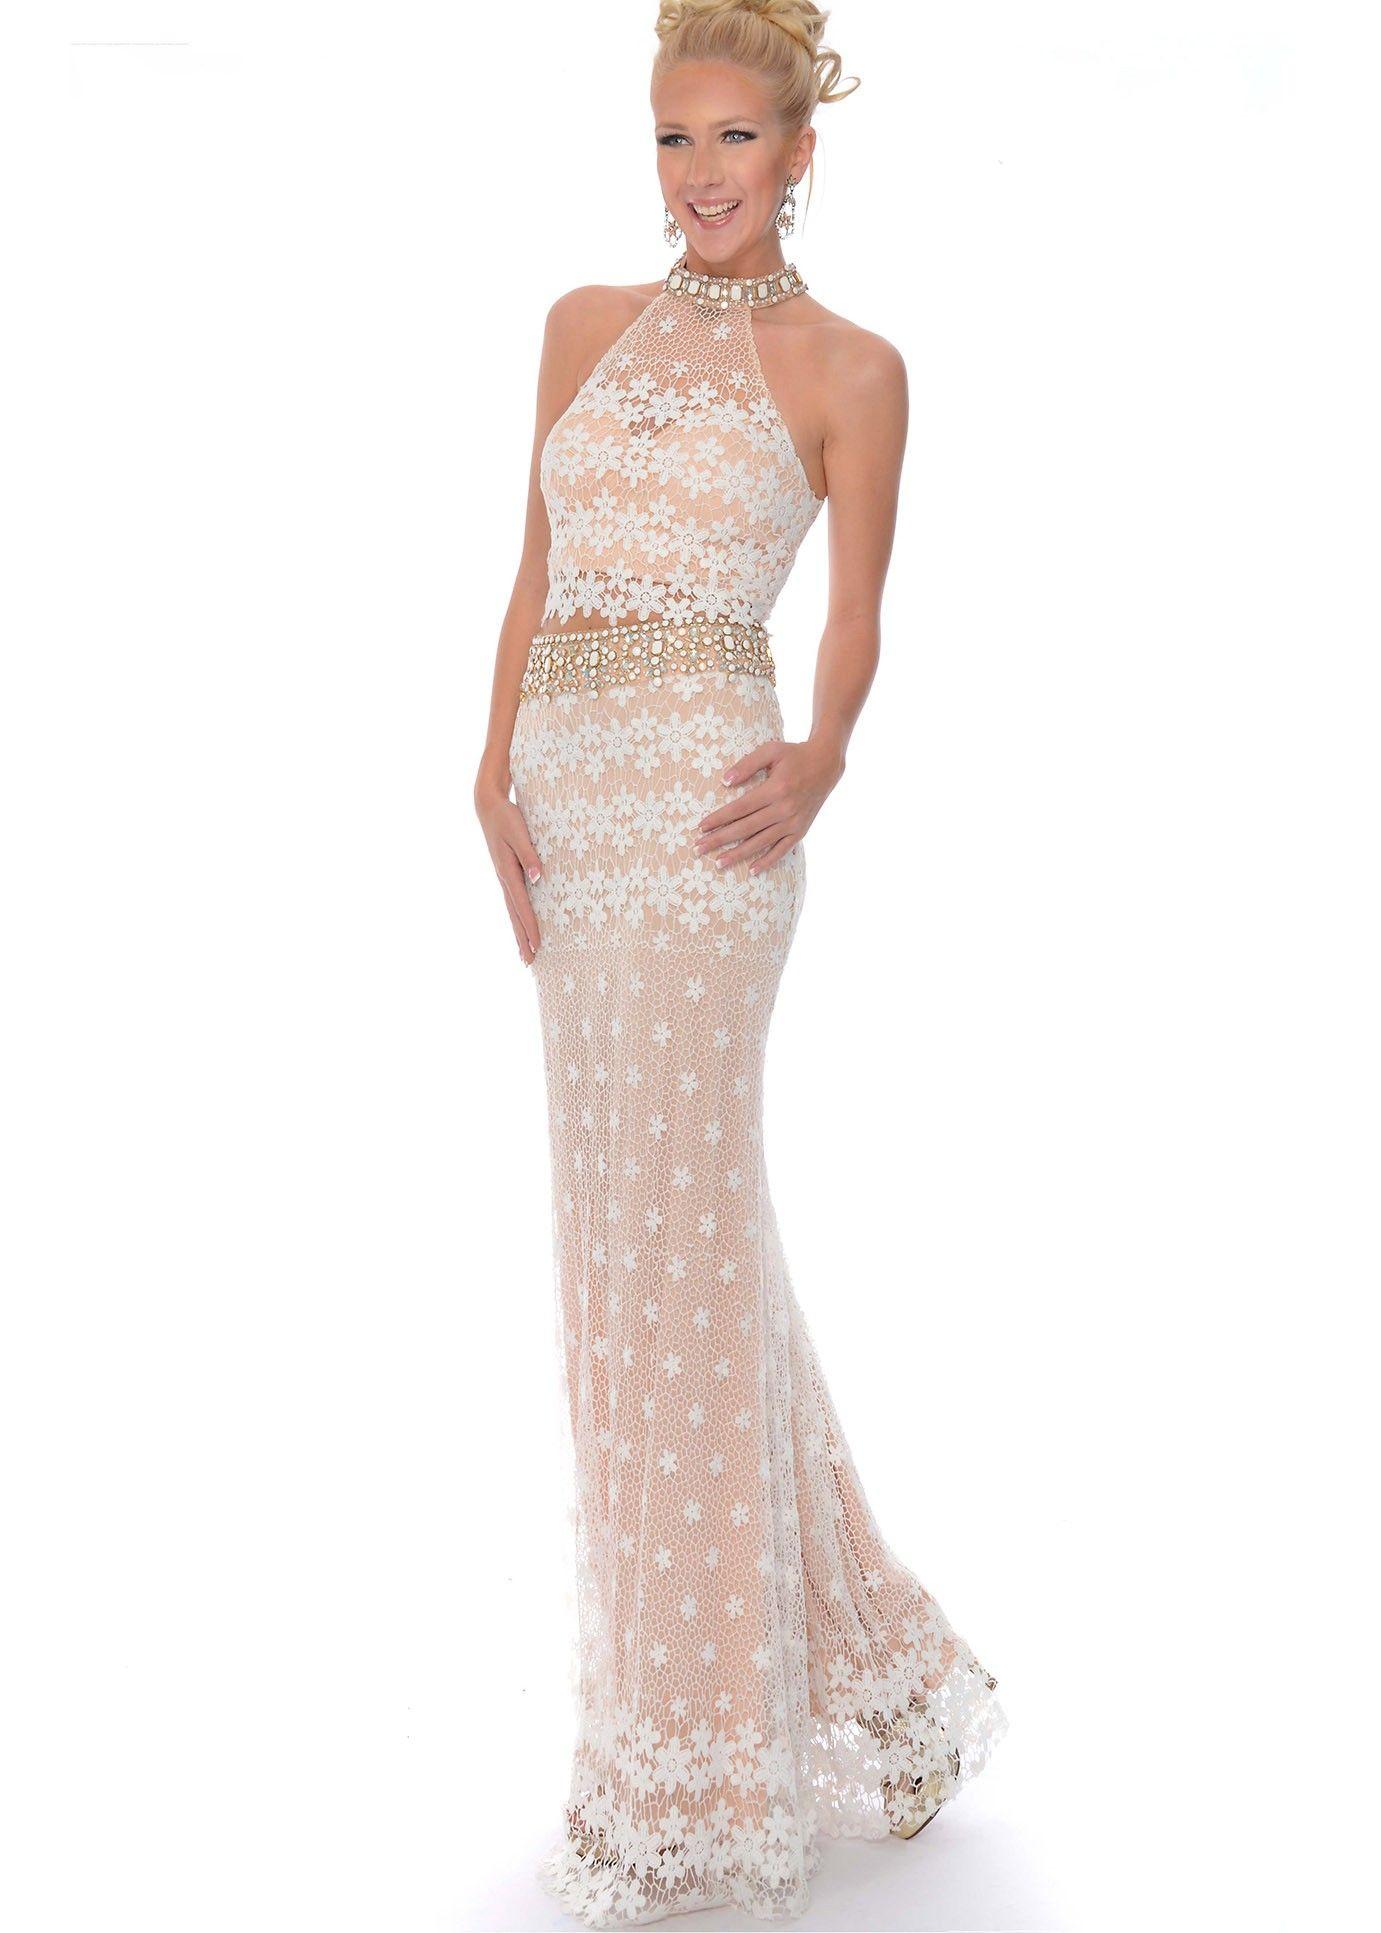 Hollywood envy by precious formals v white nude prom